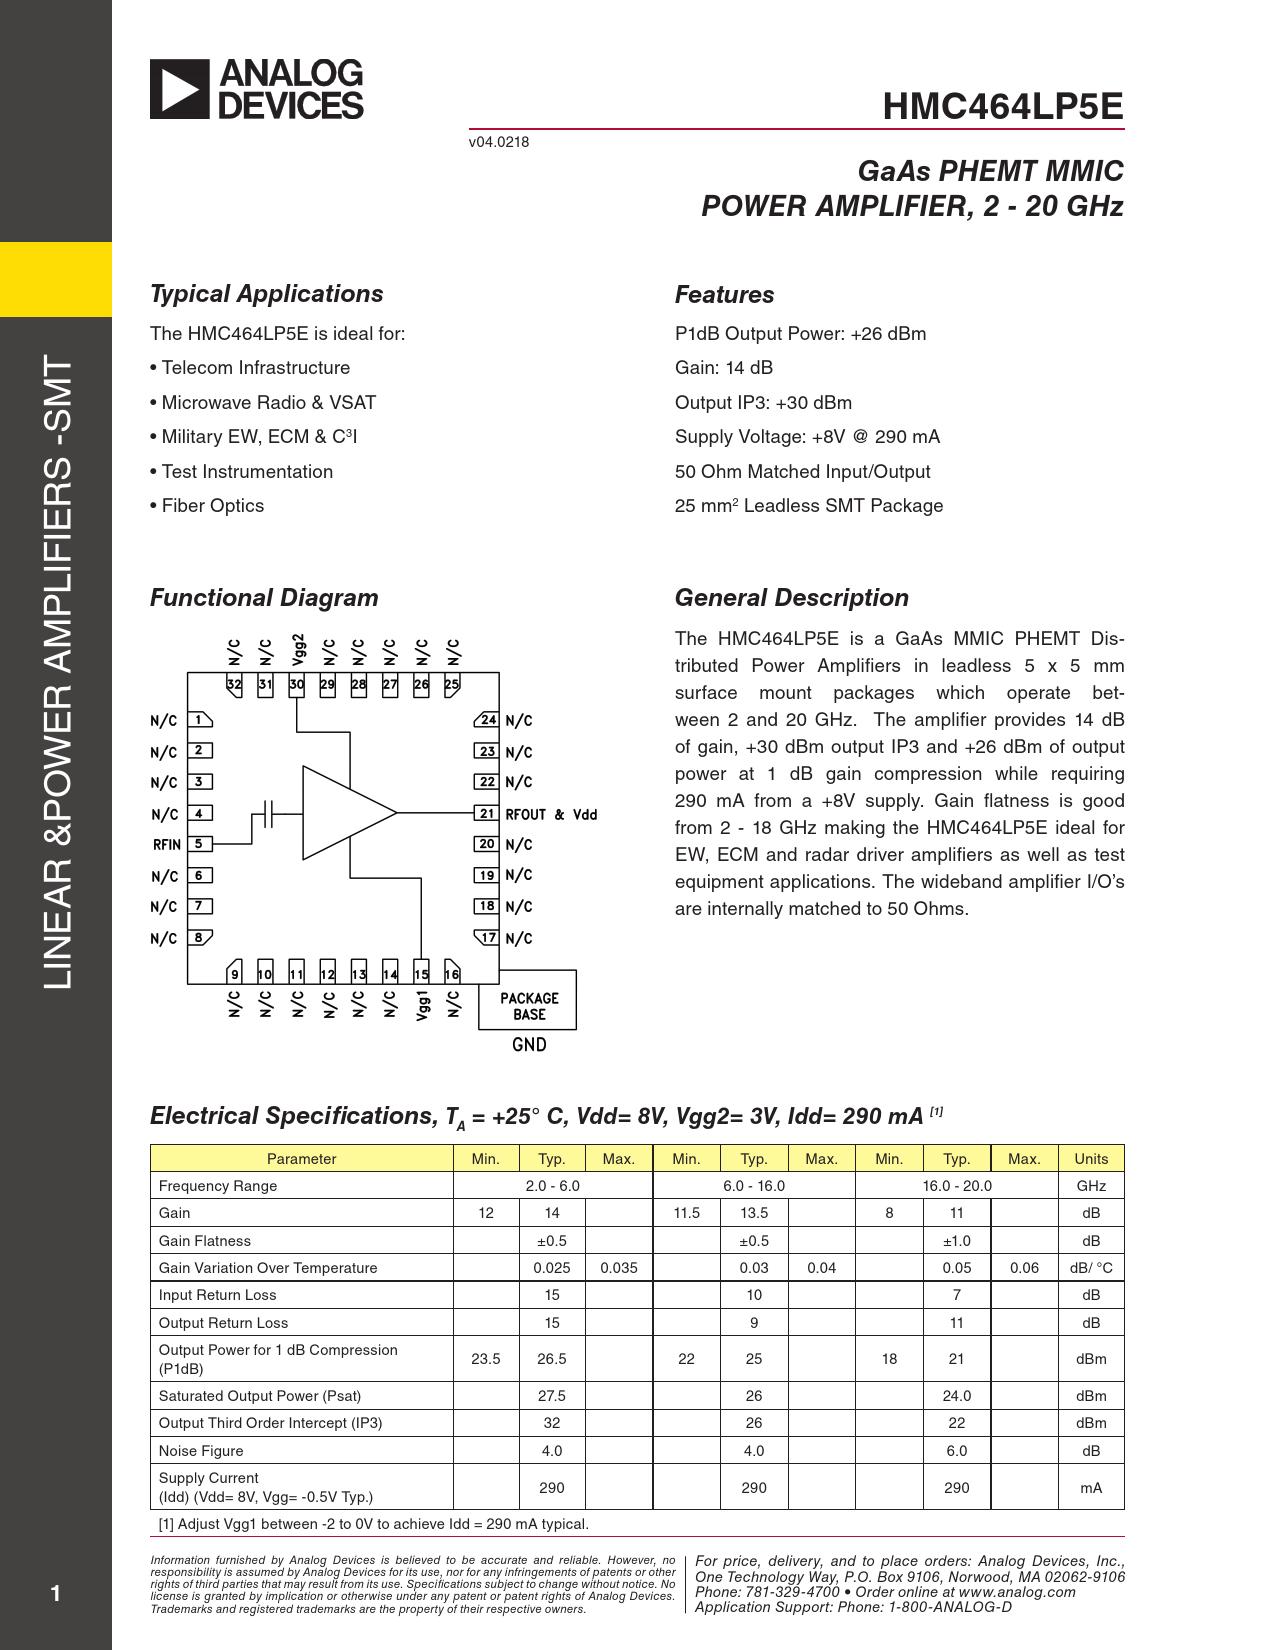 Datasheet HMC464LP5 Analog Devices